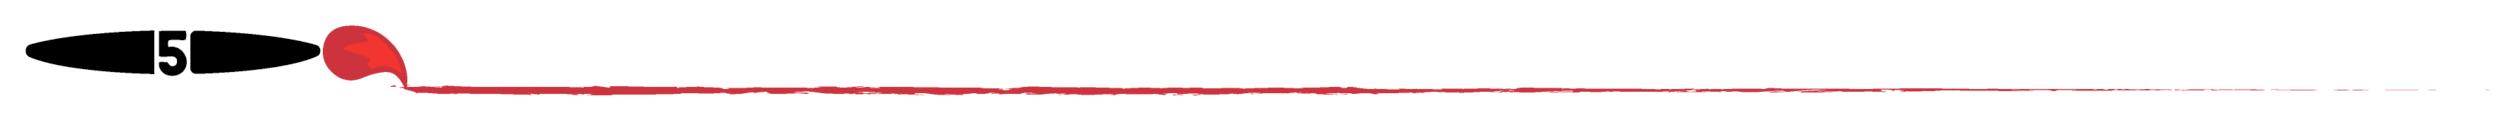 AH_logo-banner-trns.jpg